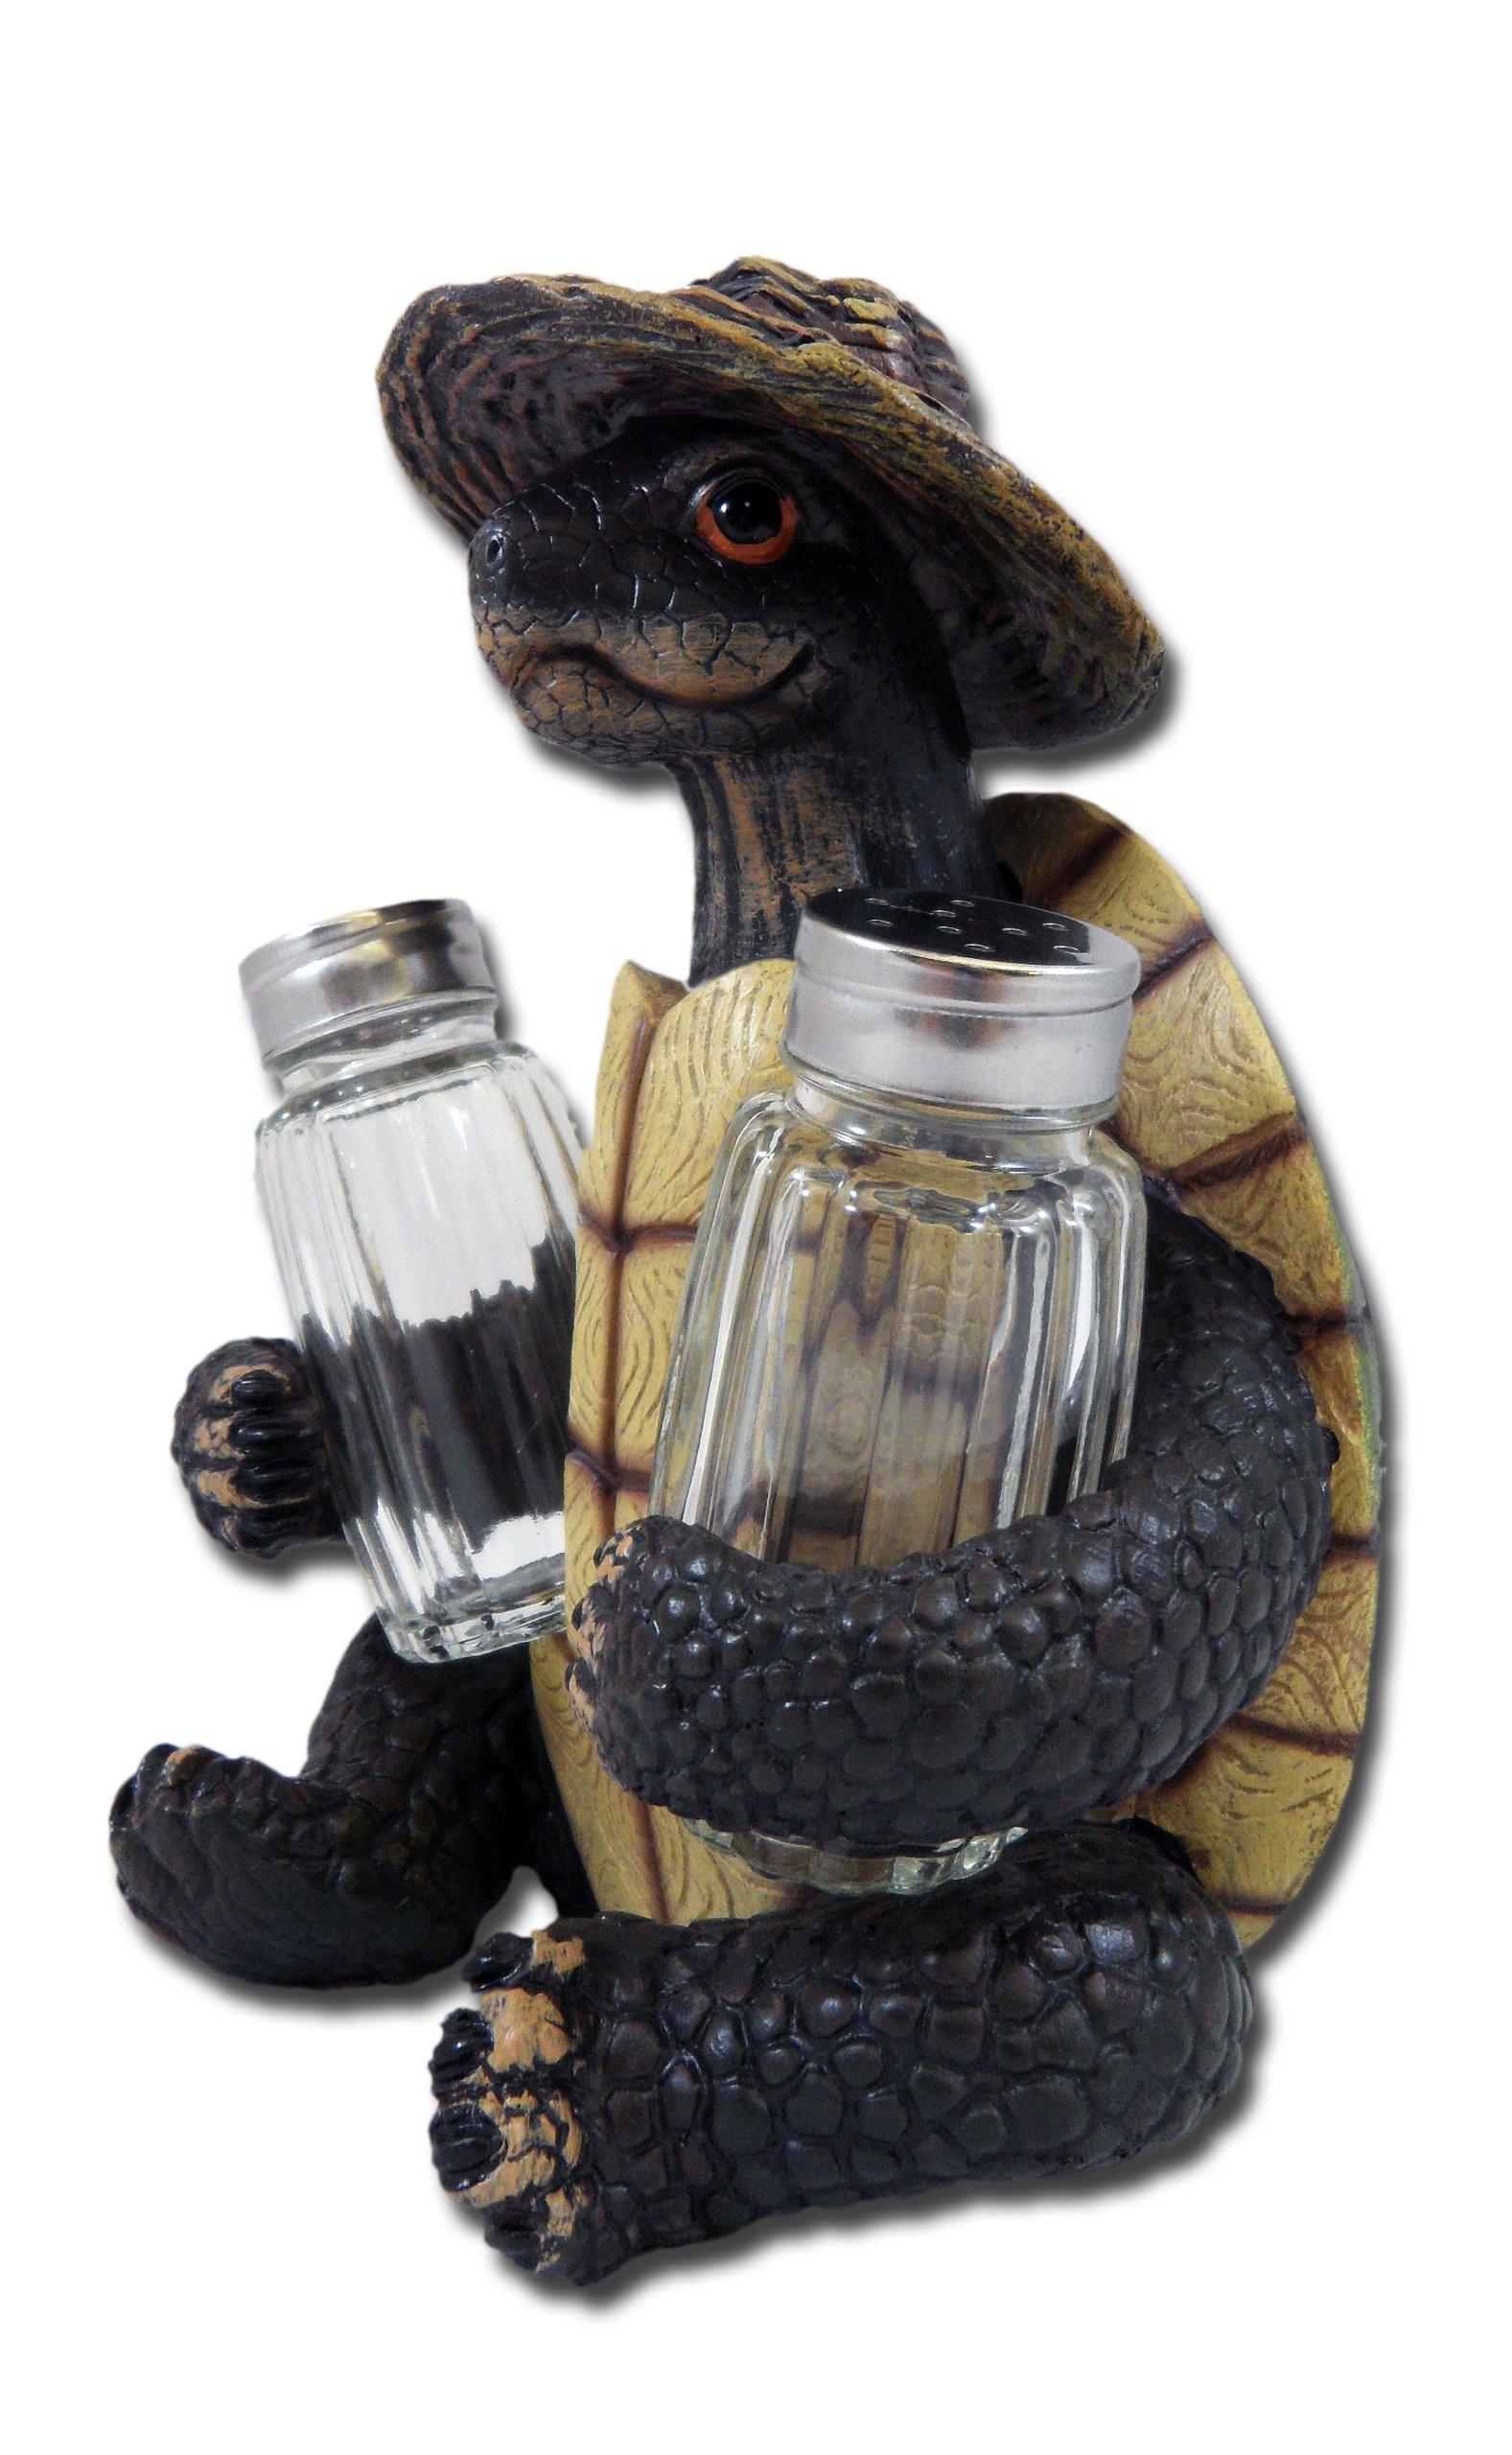 Turtle Soup Salt and Pepper Shaker Set - Green Tortoise Box Sea Turtles